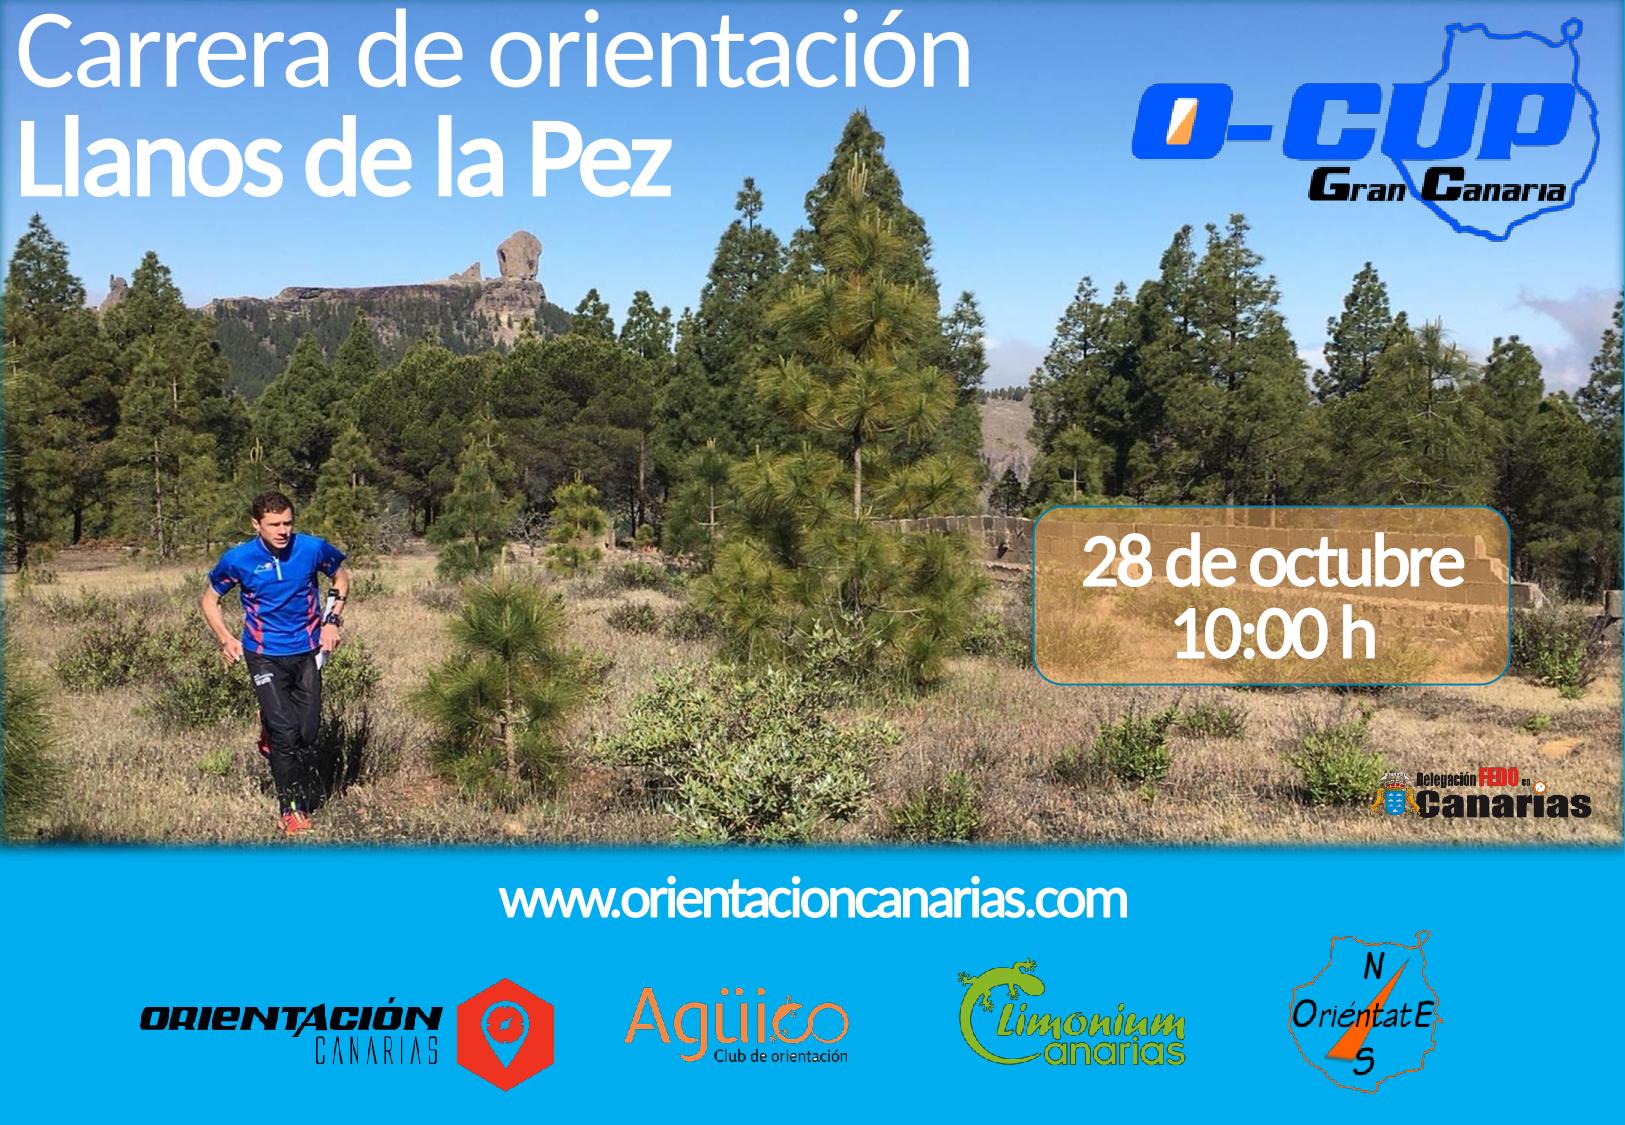 carrera_orientacion_gran_canaria_orientacion_canarias-o-cup_cartelg52